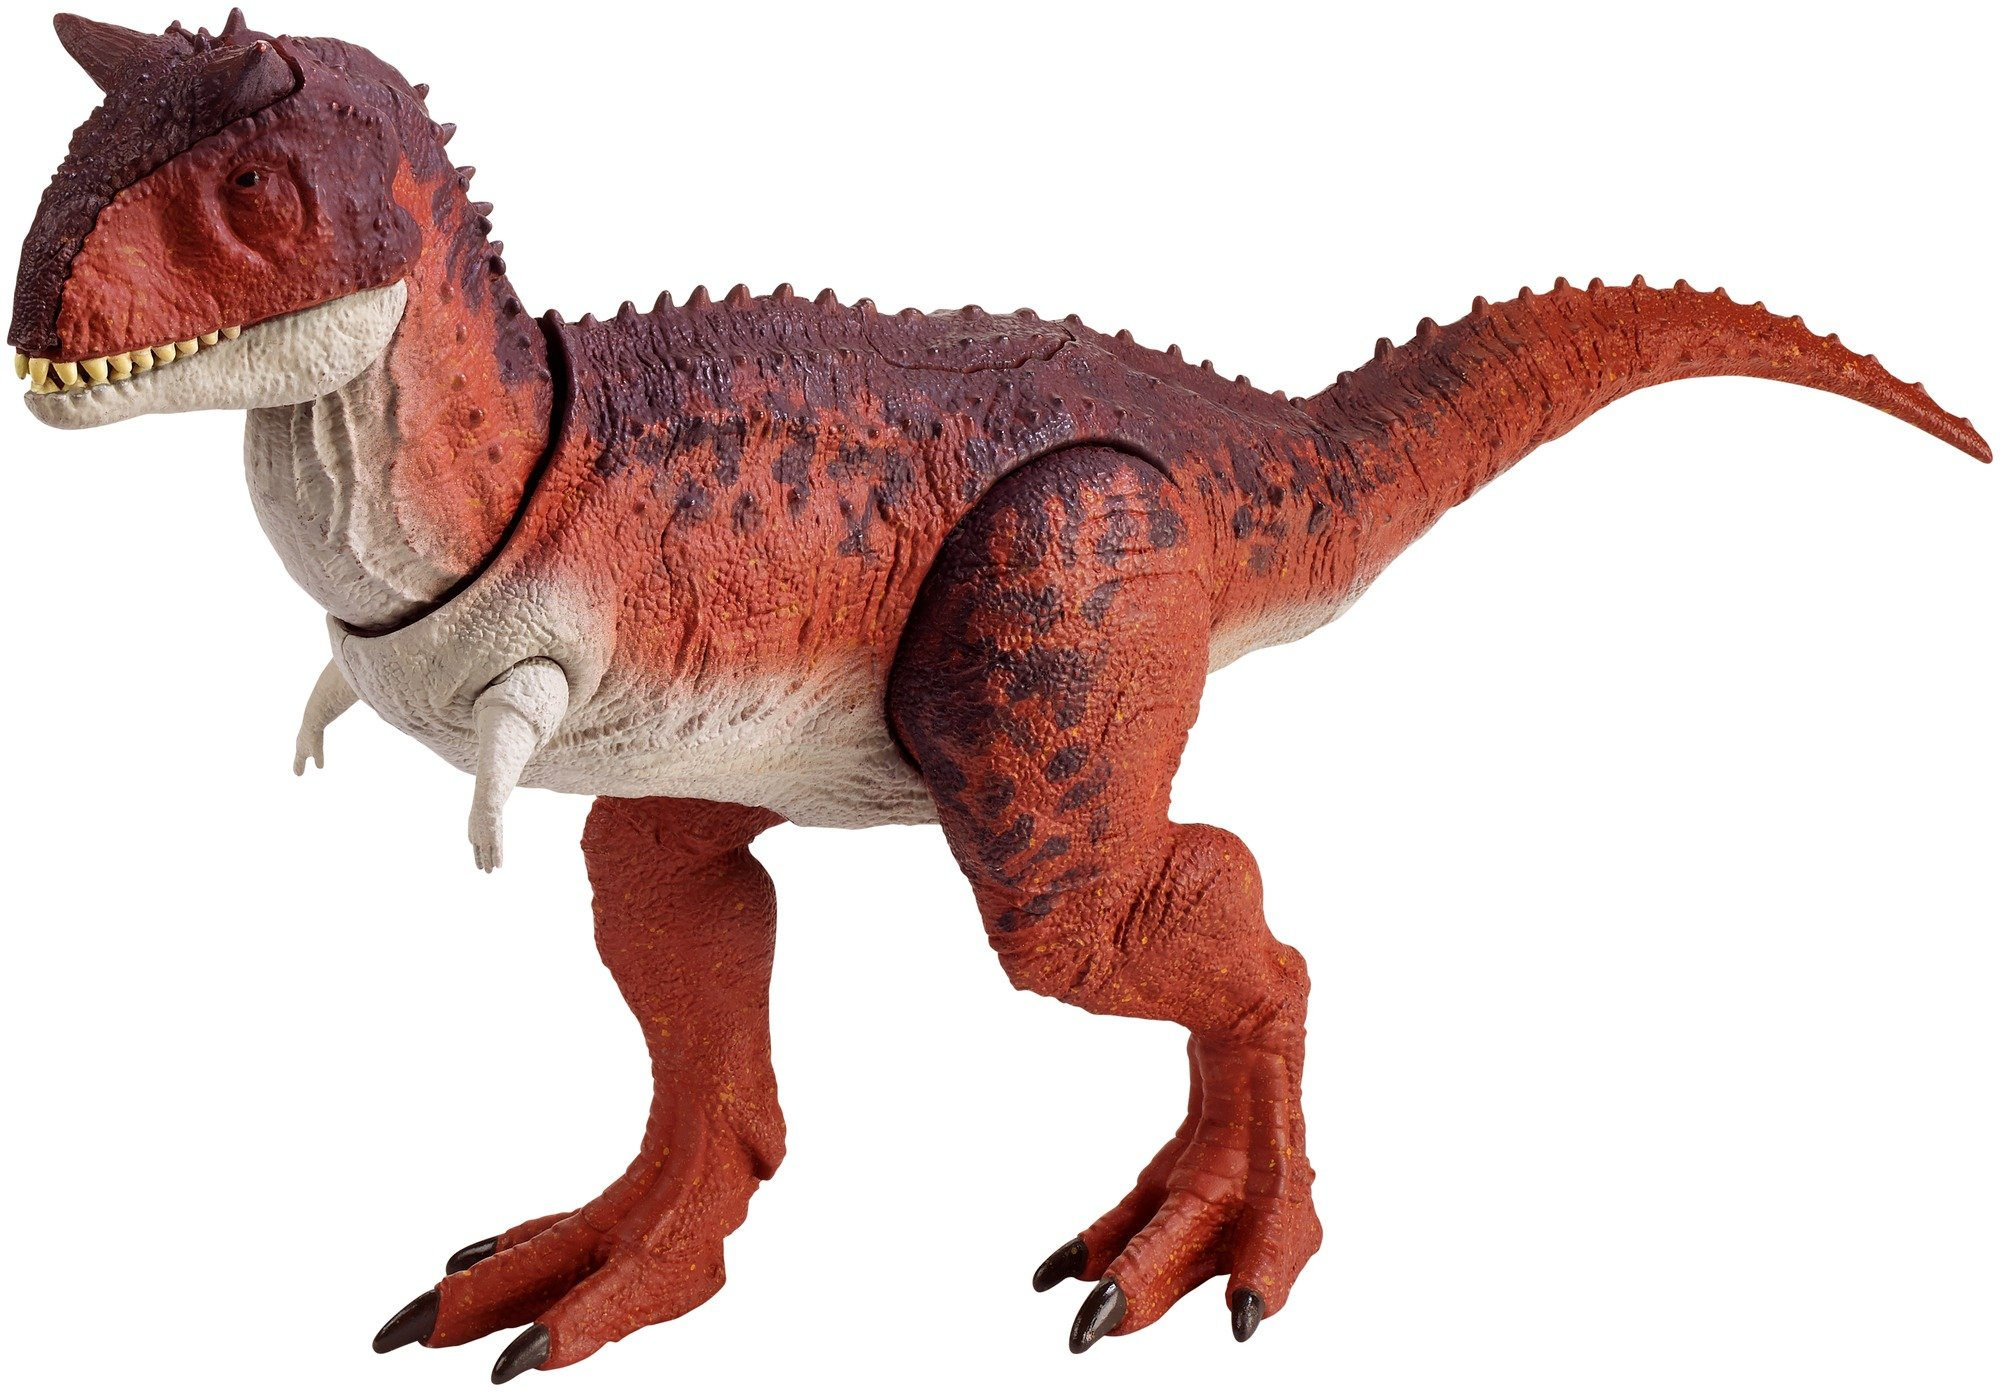 Jurassic World Action Attack Carnotaurus Figure by Jurassic World Toys (Image #1)